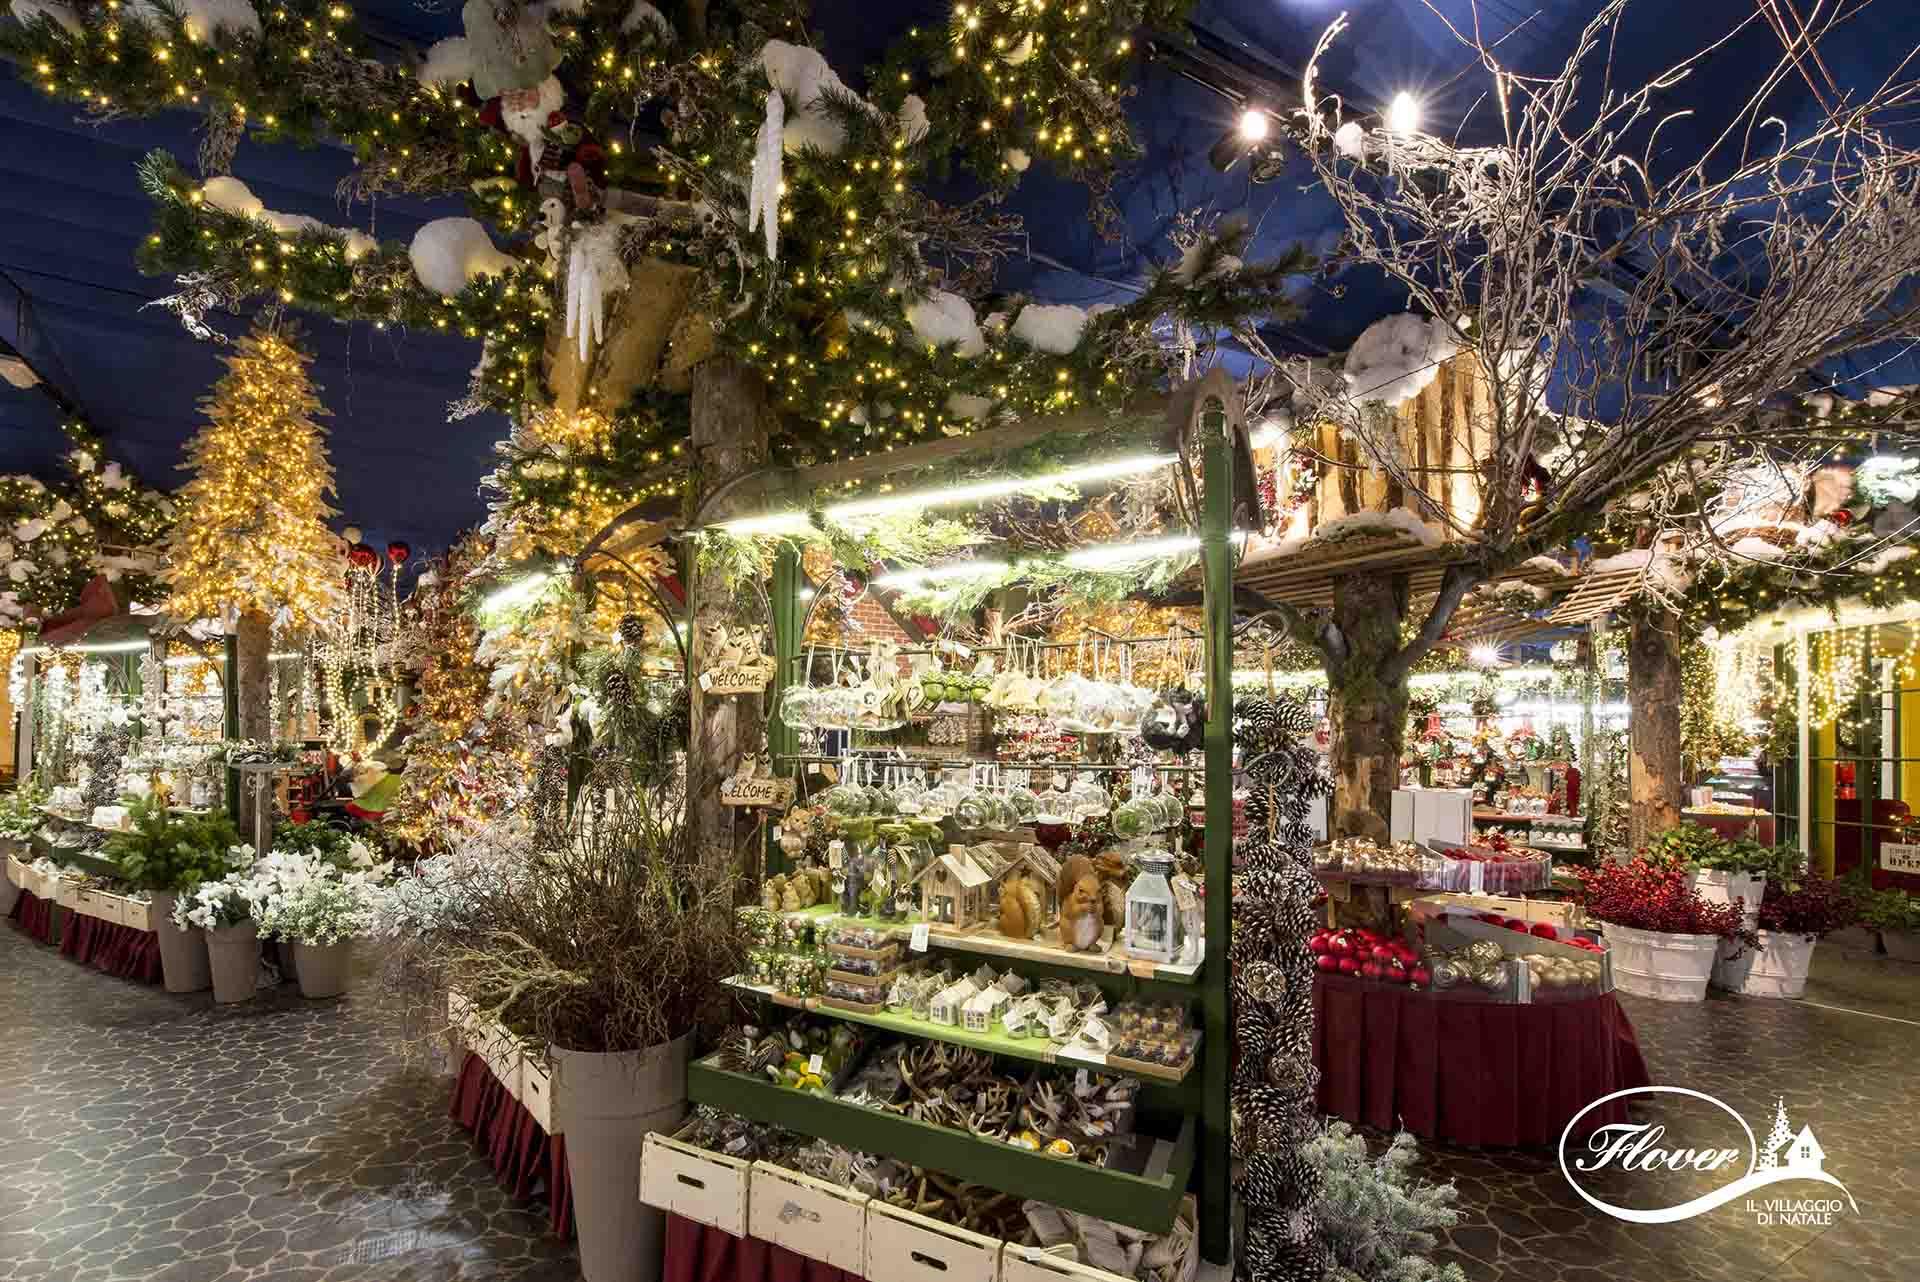 Villaggio di Natale Flover 2017  Carnet Verona  Carnet Verona